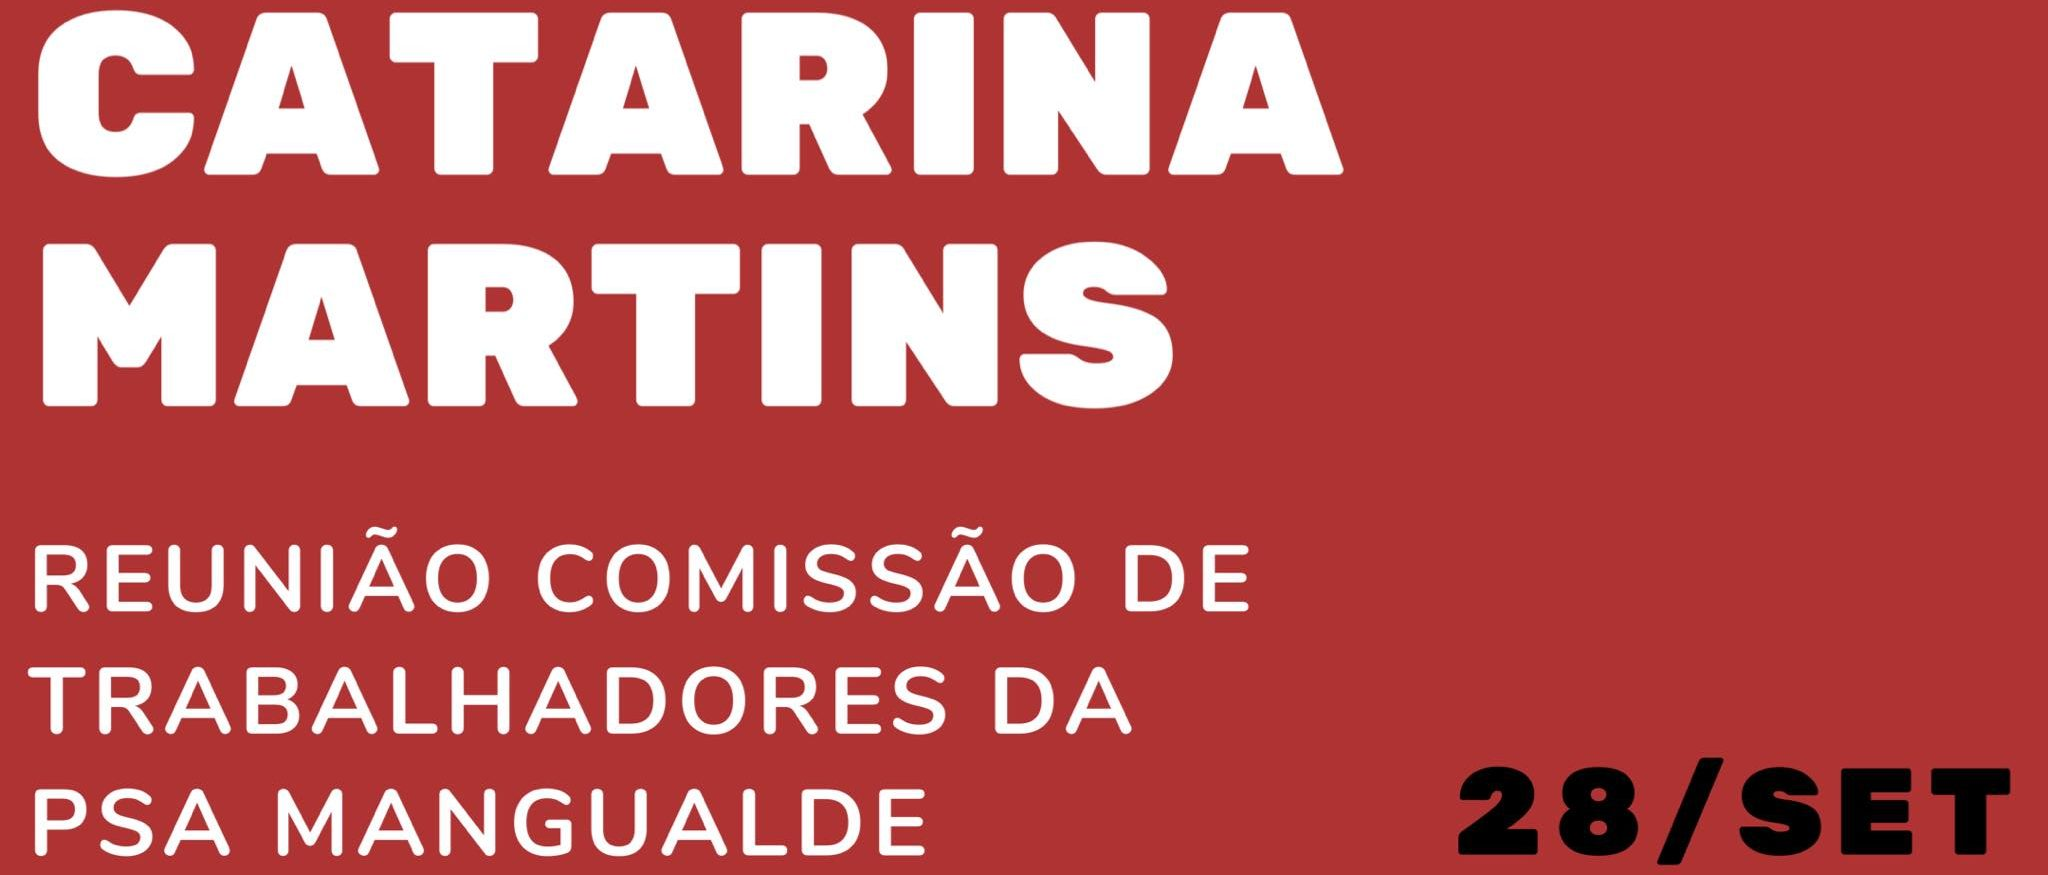 Catarina Martins amanhã na PSA Mangualde